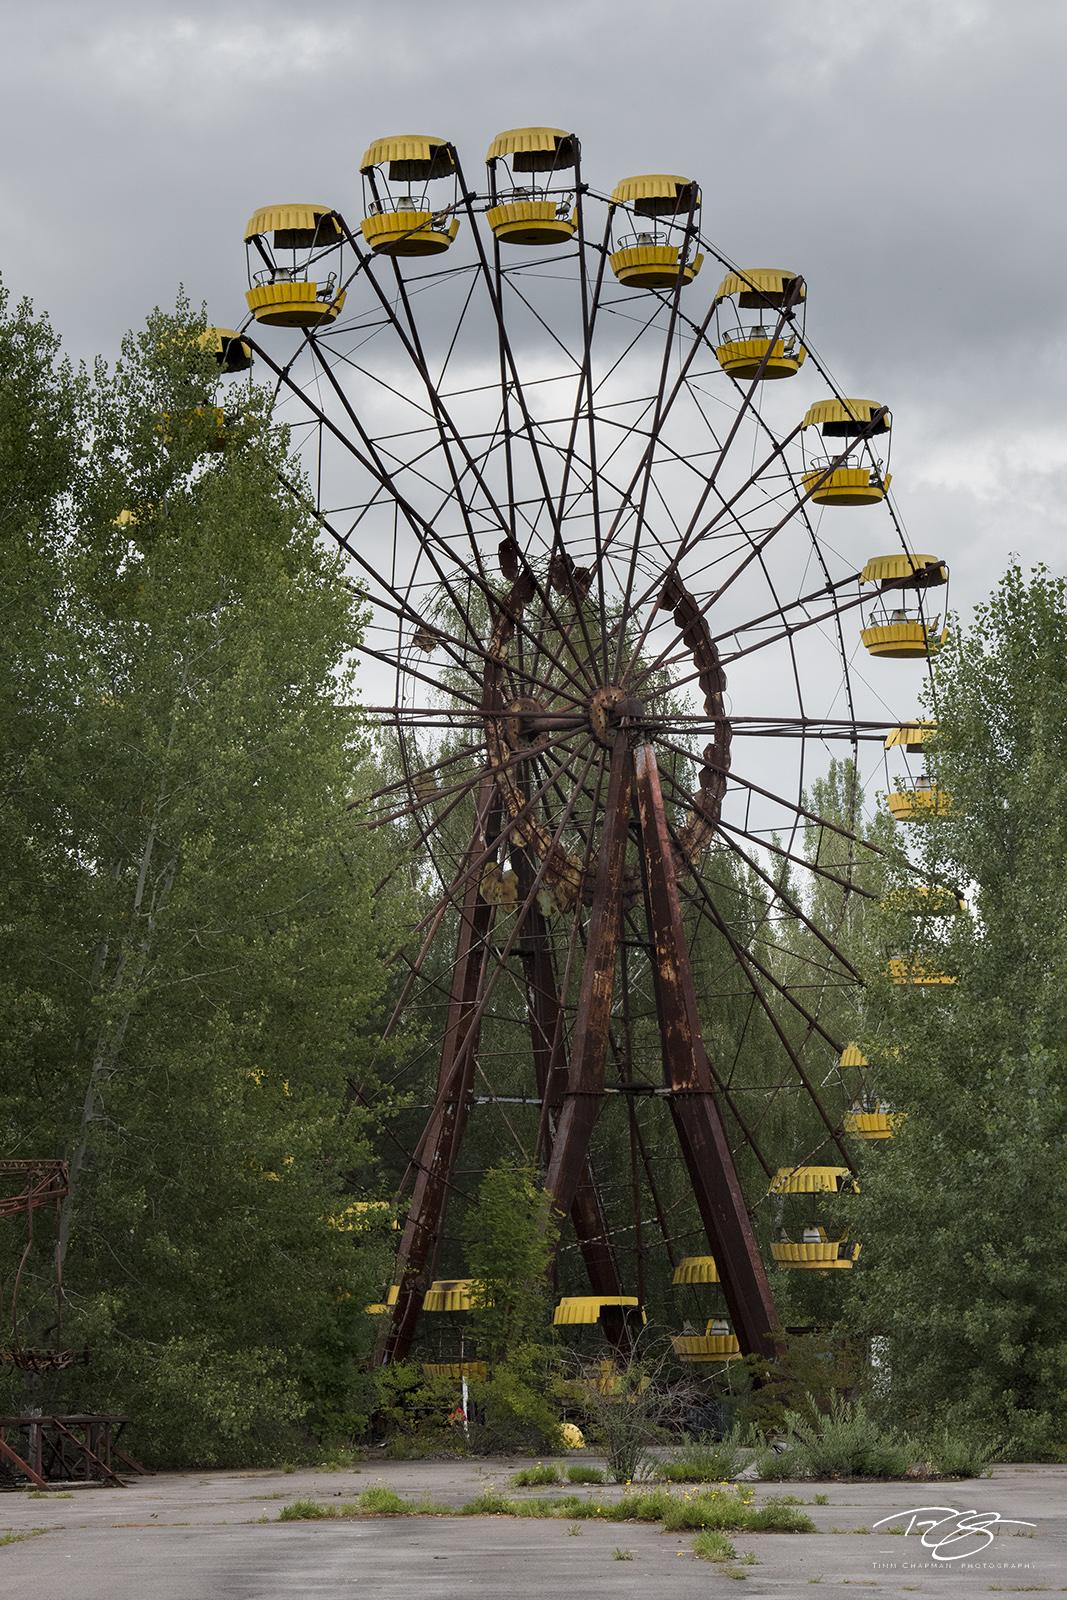 chernobyl, chornobyl, pripyat, exclusion zone, abandoned, forgotten, wasteland, radioactive, decay, rust, ferris wheel, amusement park, spooky, pripyat, yellow, fair, state fair, Not Amused, mold, photo